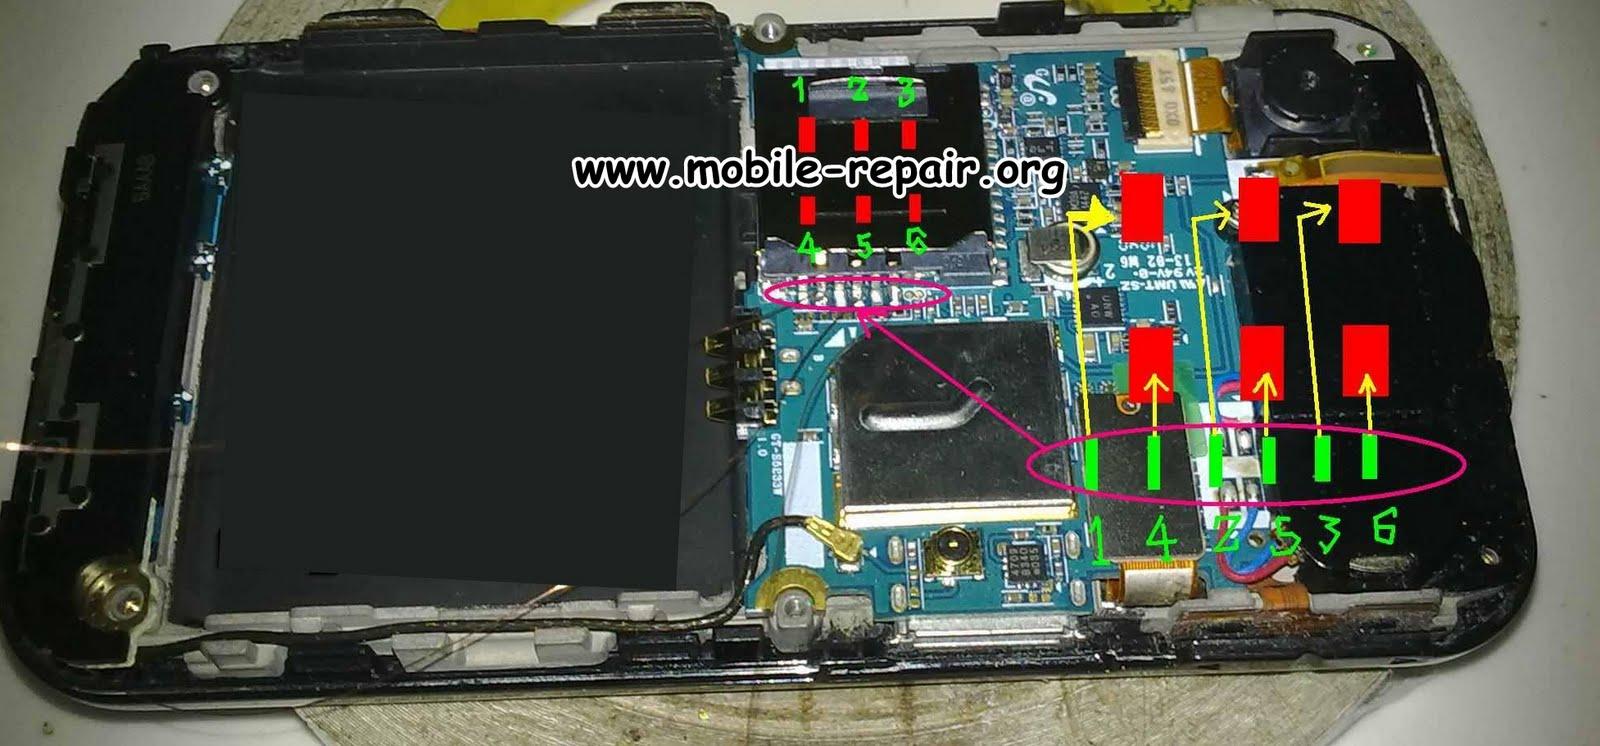 Samsung S5233 Insert Sim Card Problem